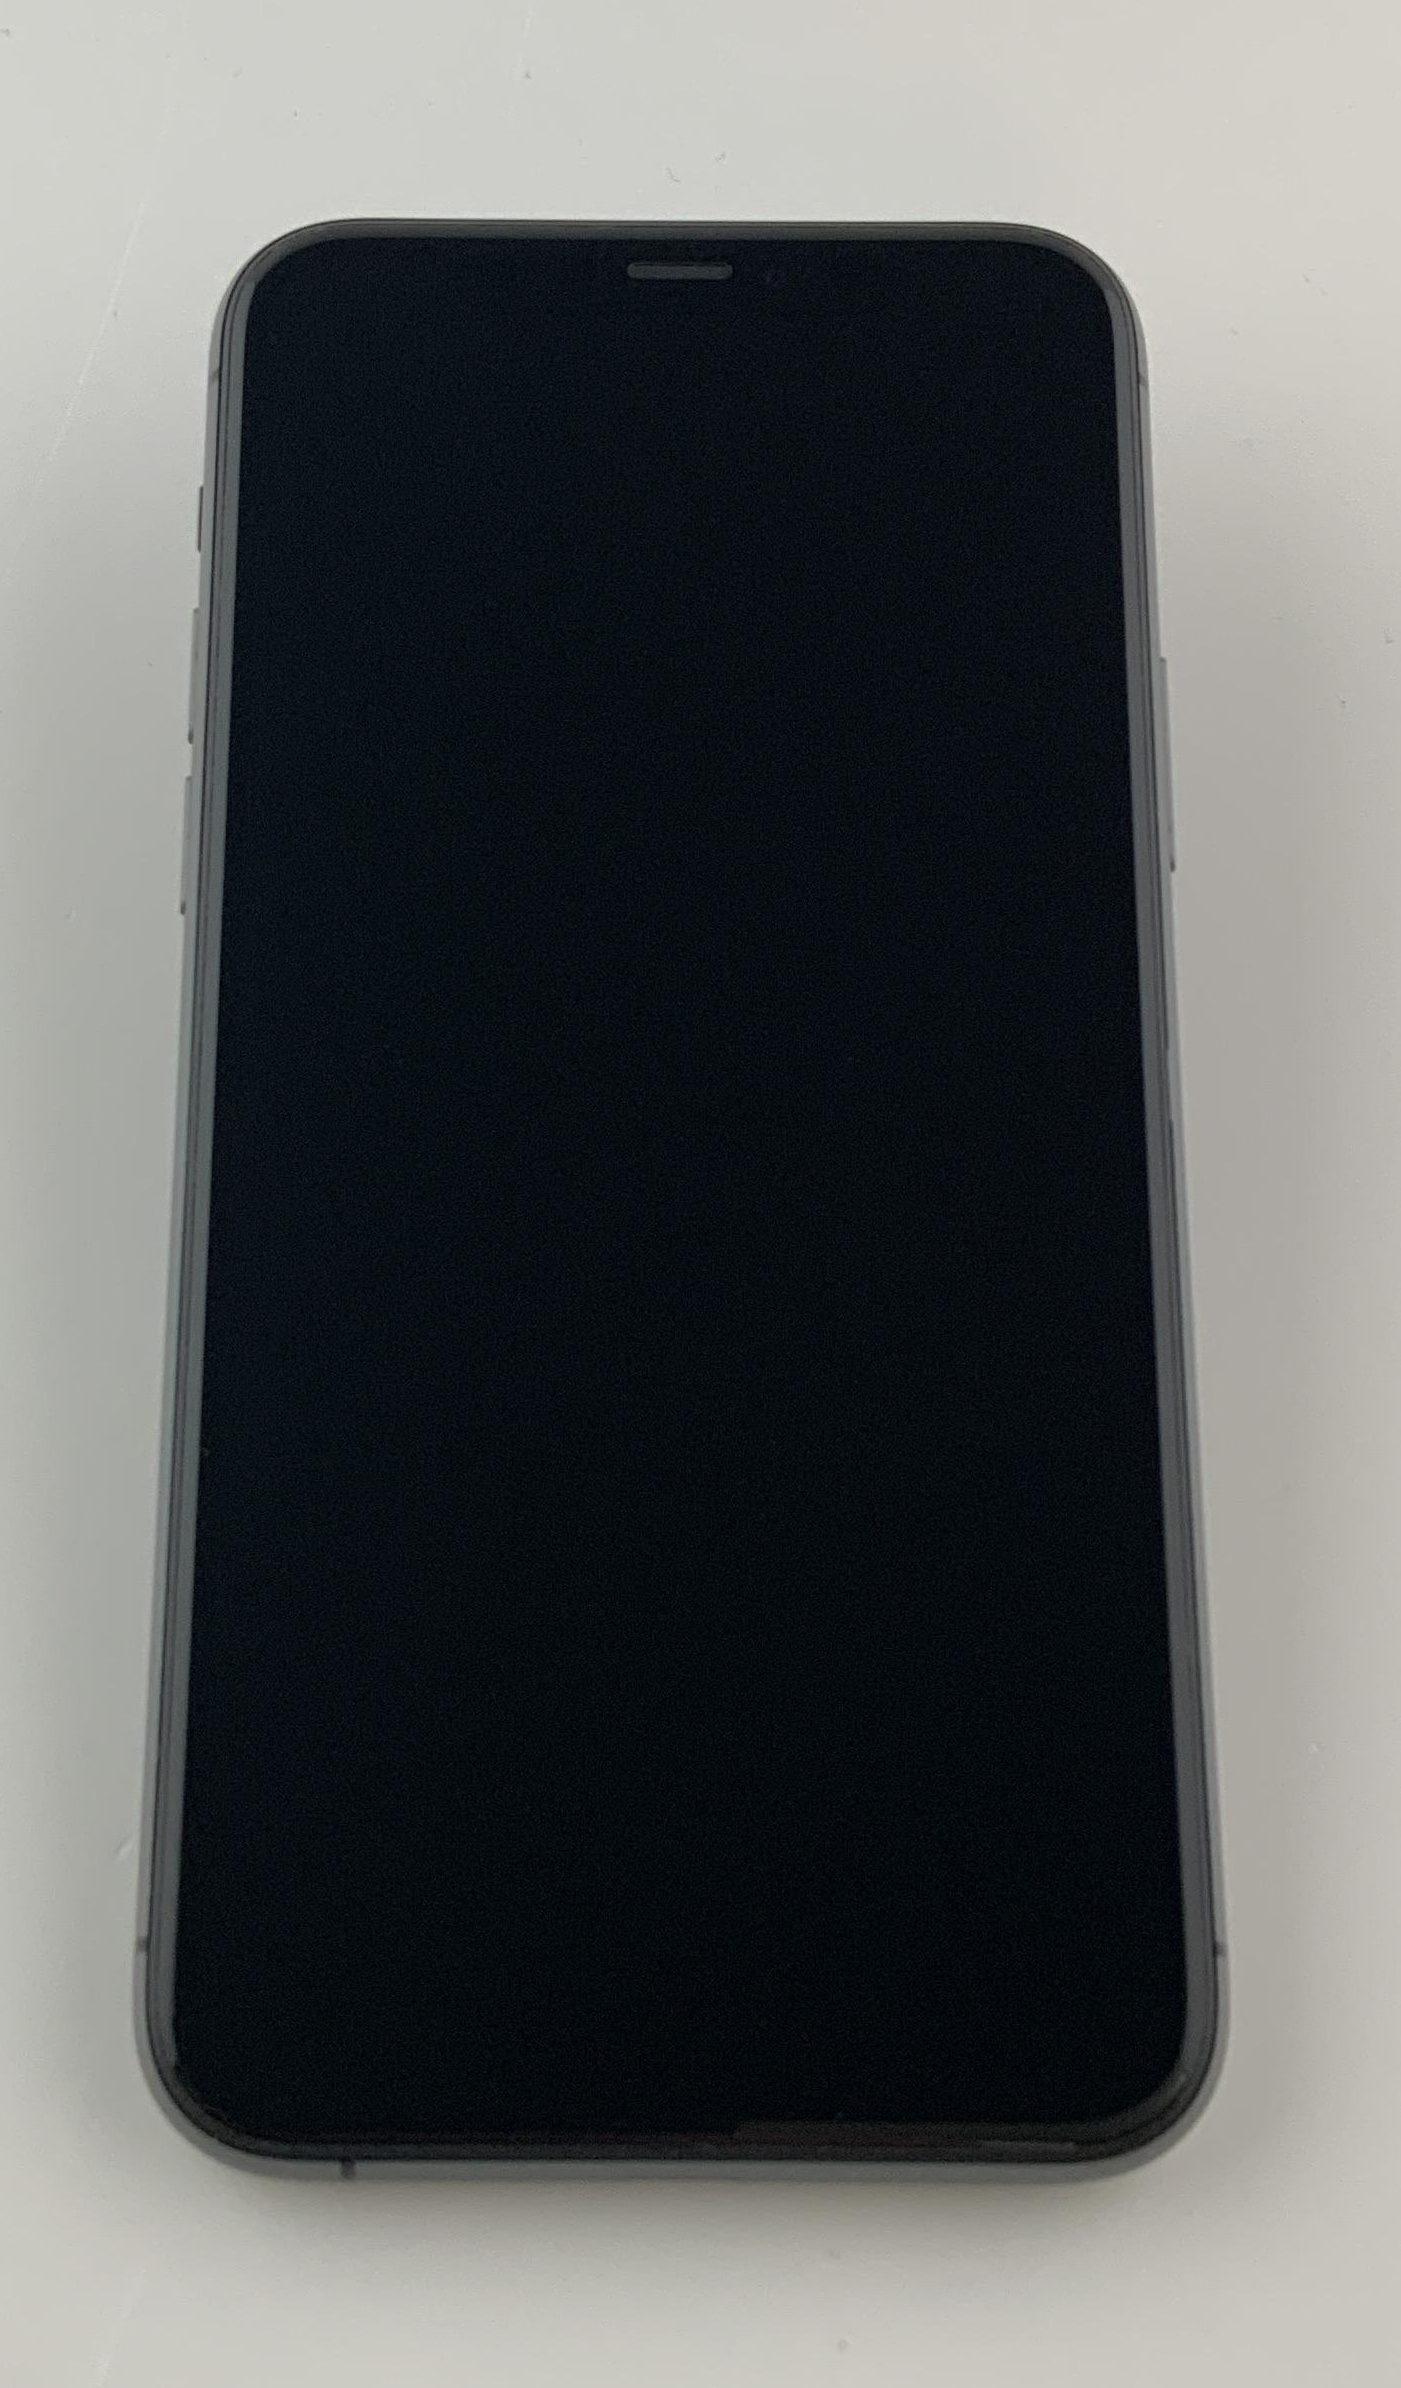 iPhone 11 Pro 256GB, 256GB, Space Gray, Bild 1